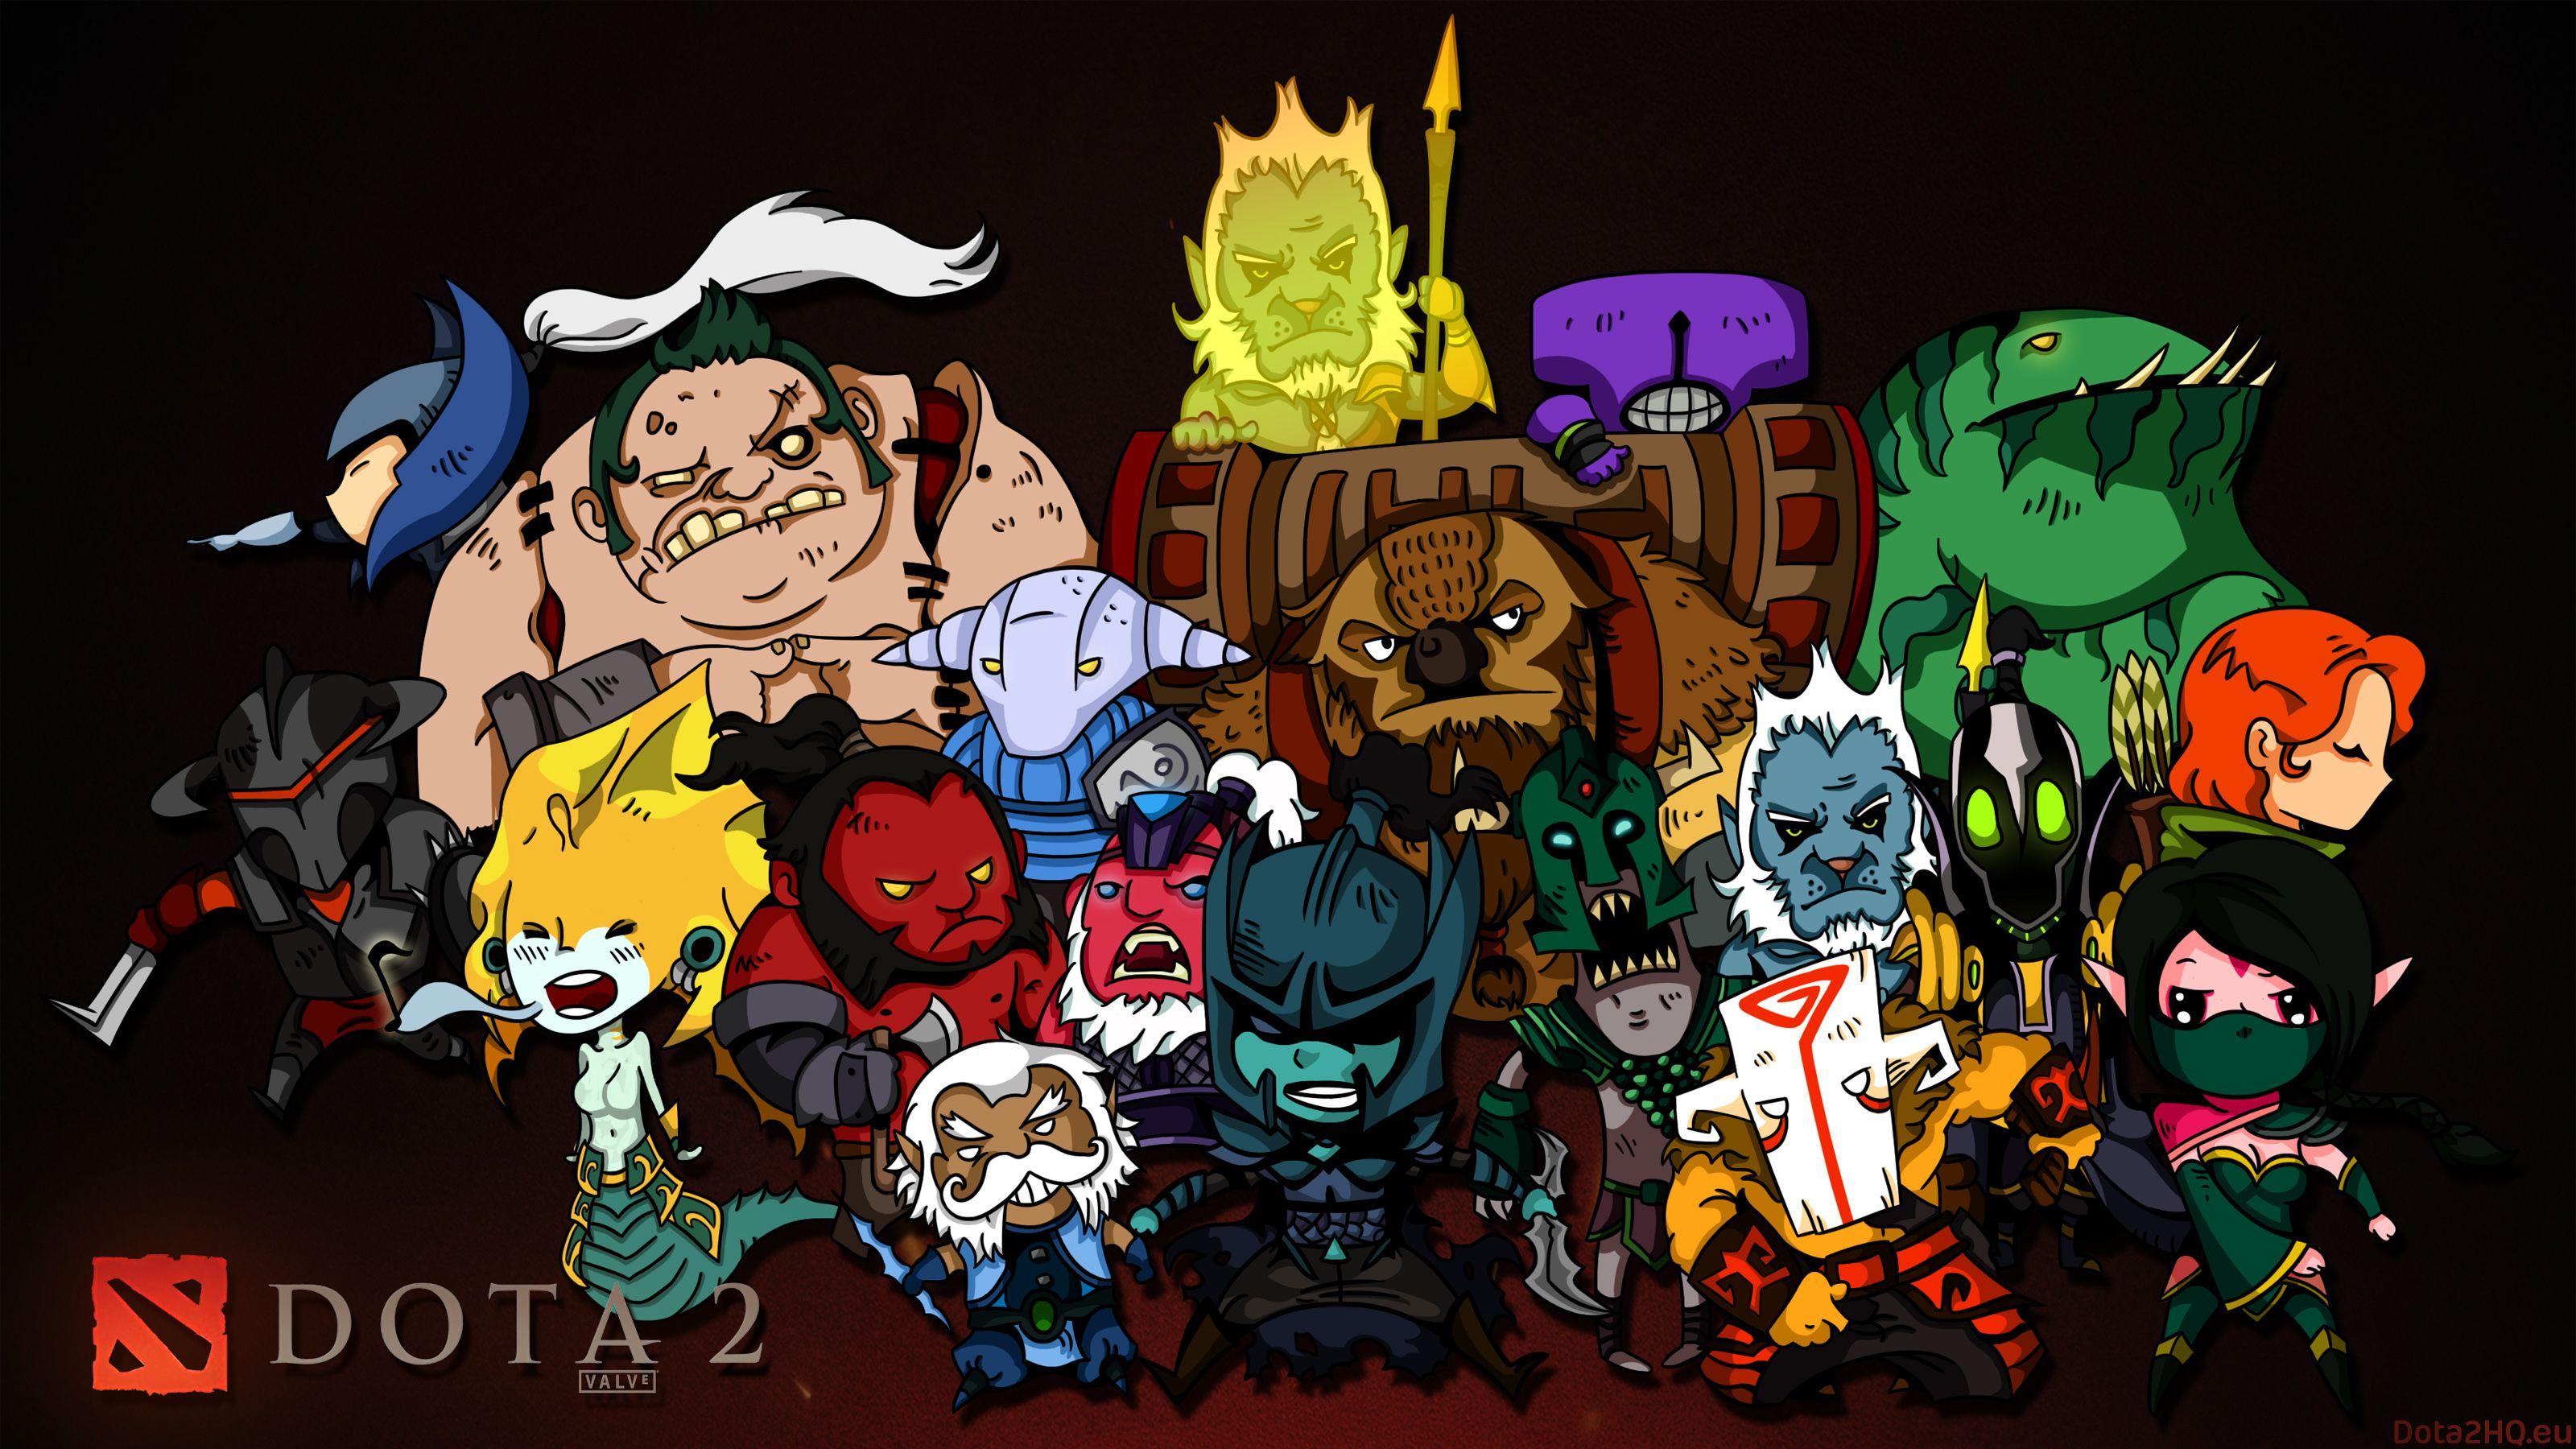 Dota 2 Chibi Heroes Wallpaper 3200x1800 px Free Download ...